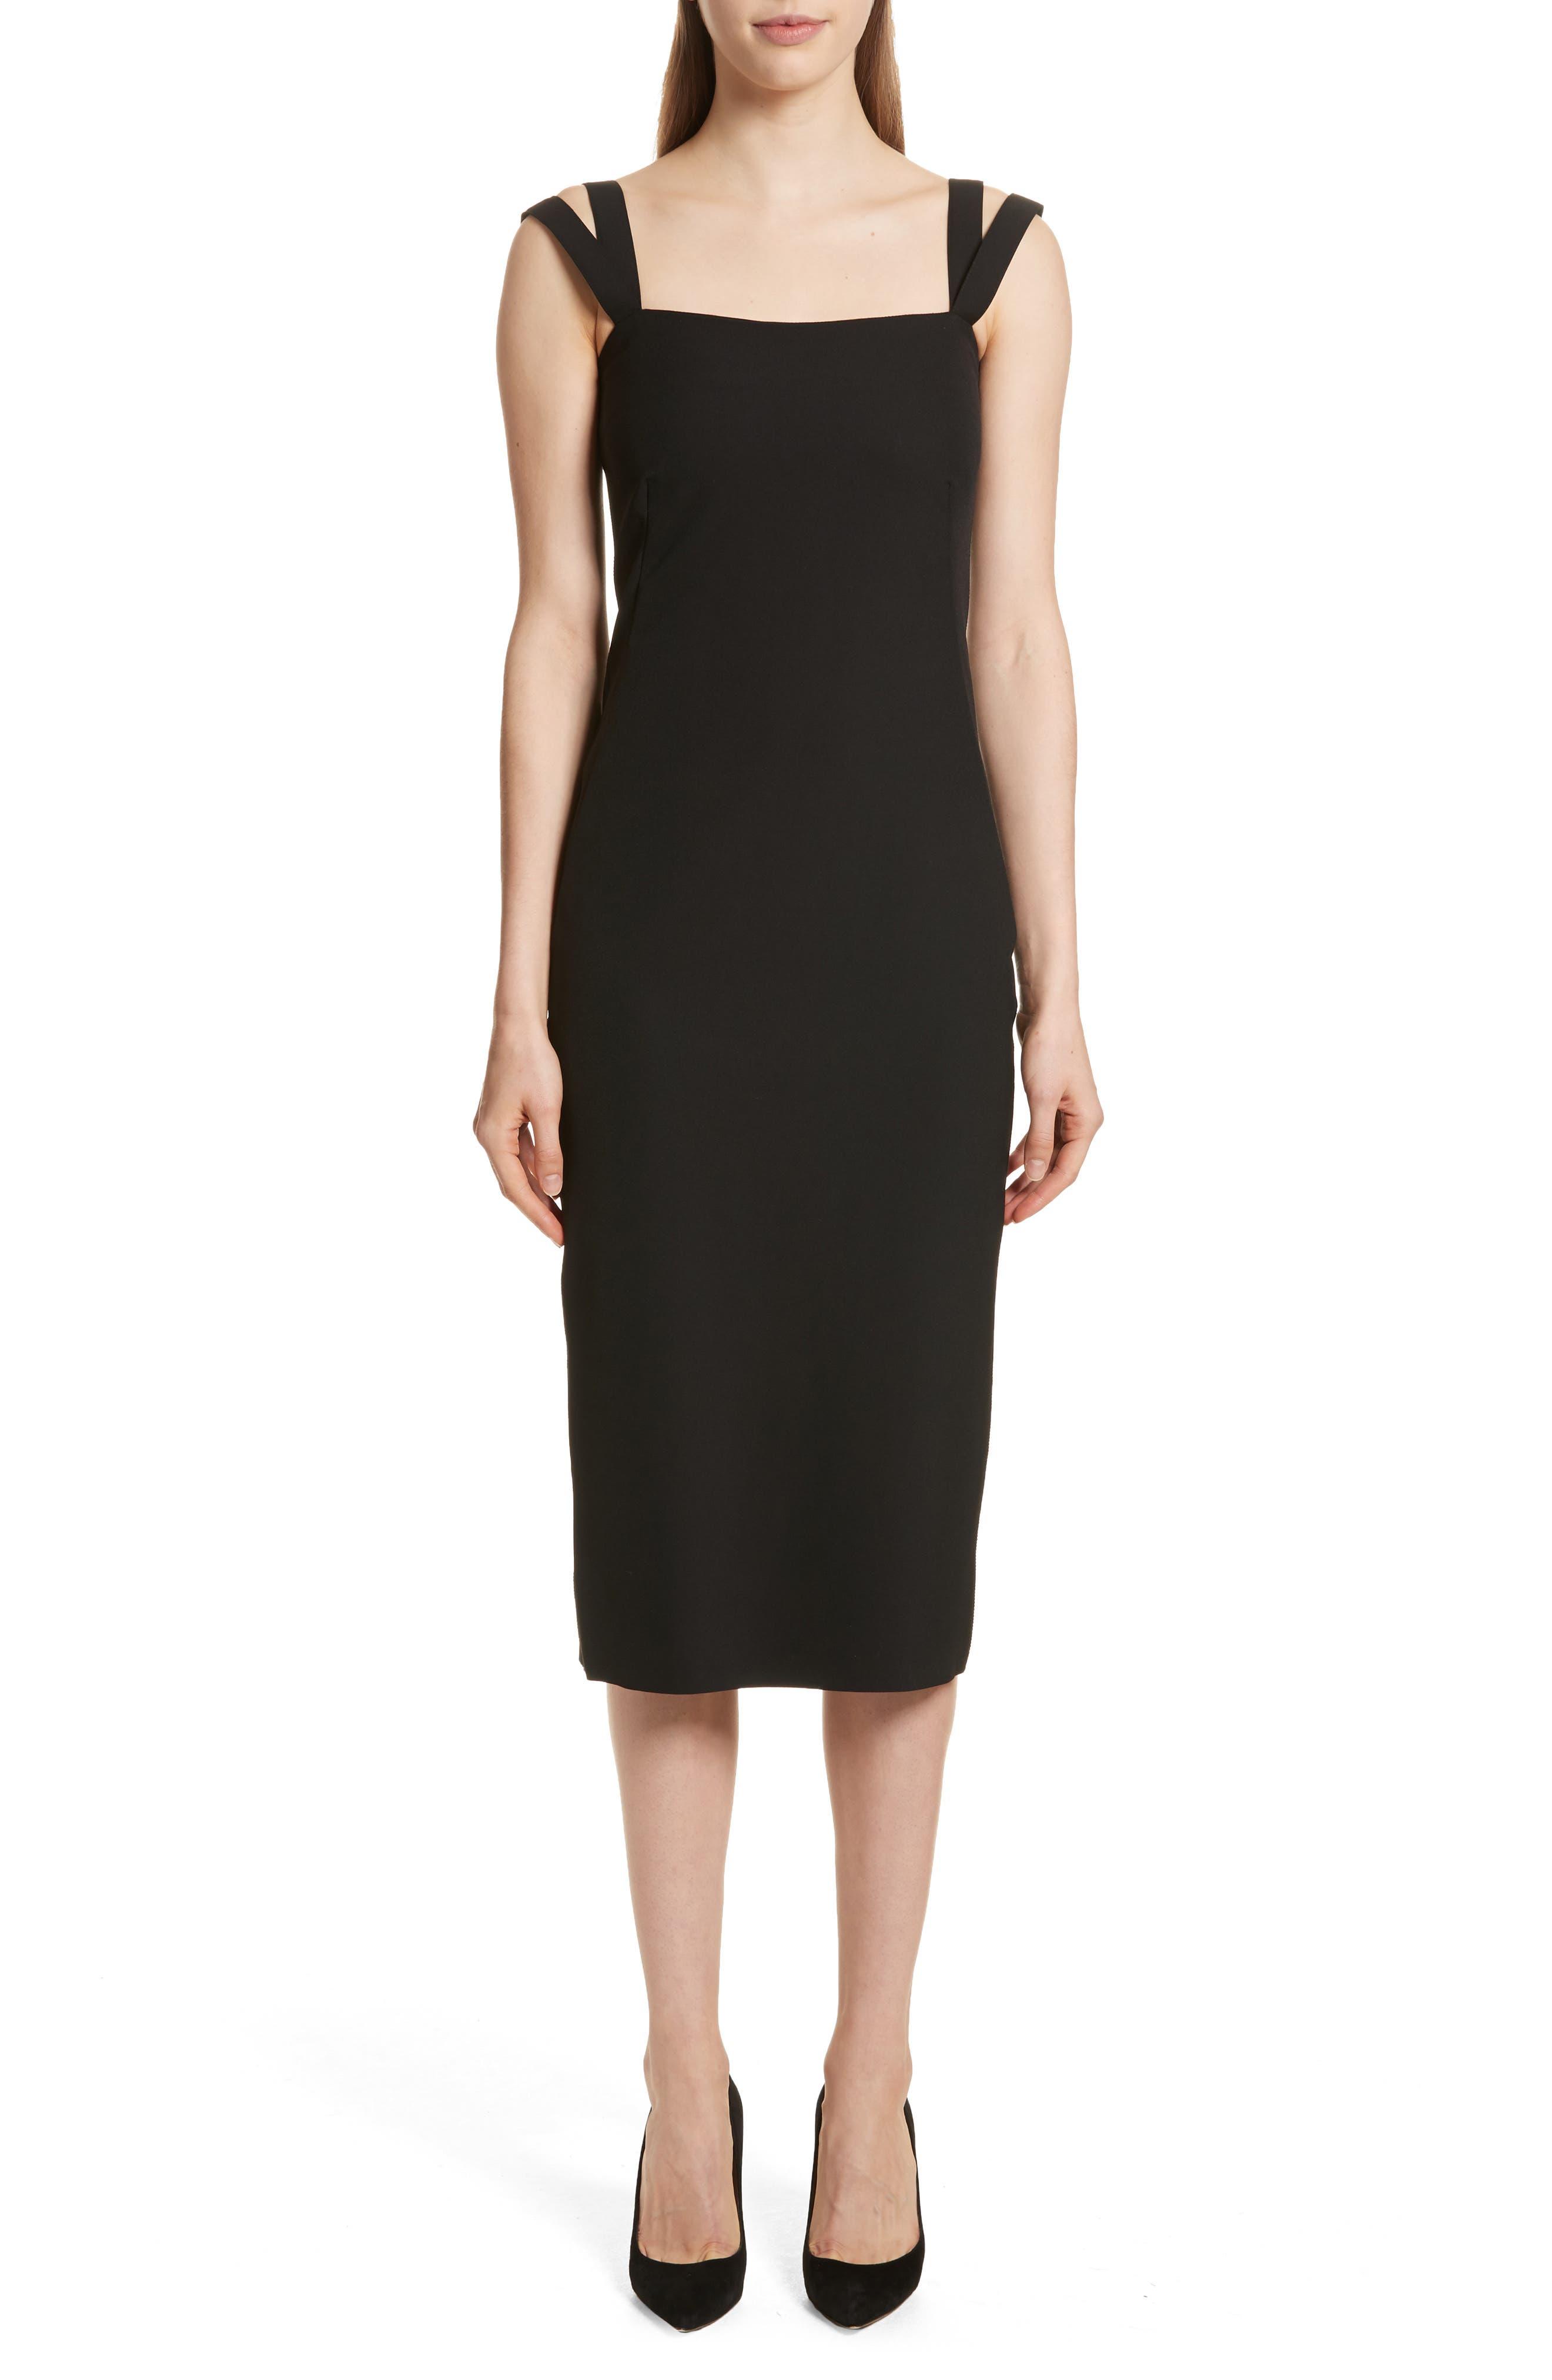 Perform Tech Perfect Sheath Dress,                         Main,                         color, Black